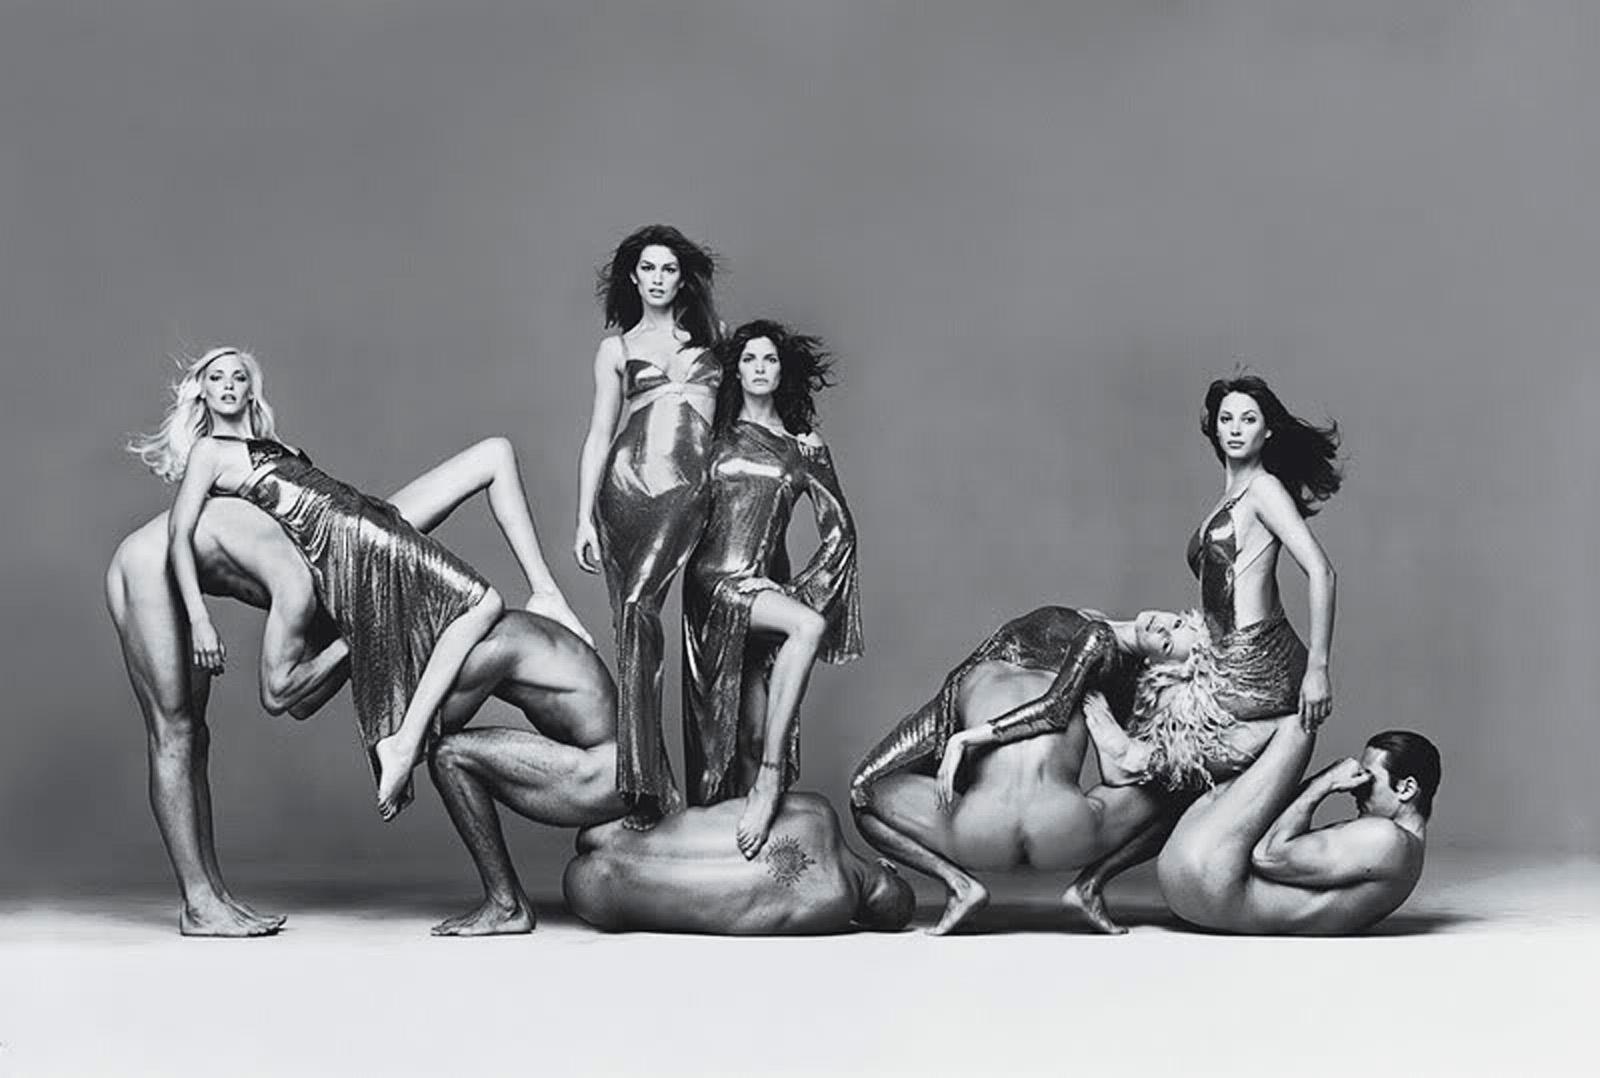 richard-avedon-versace-campaign-group-shot